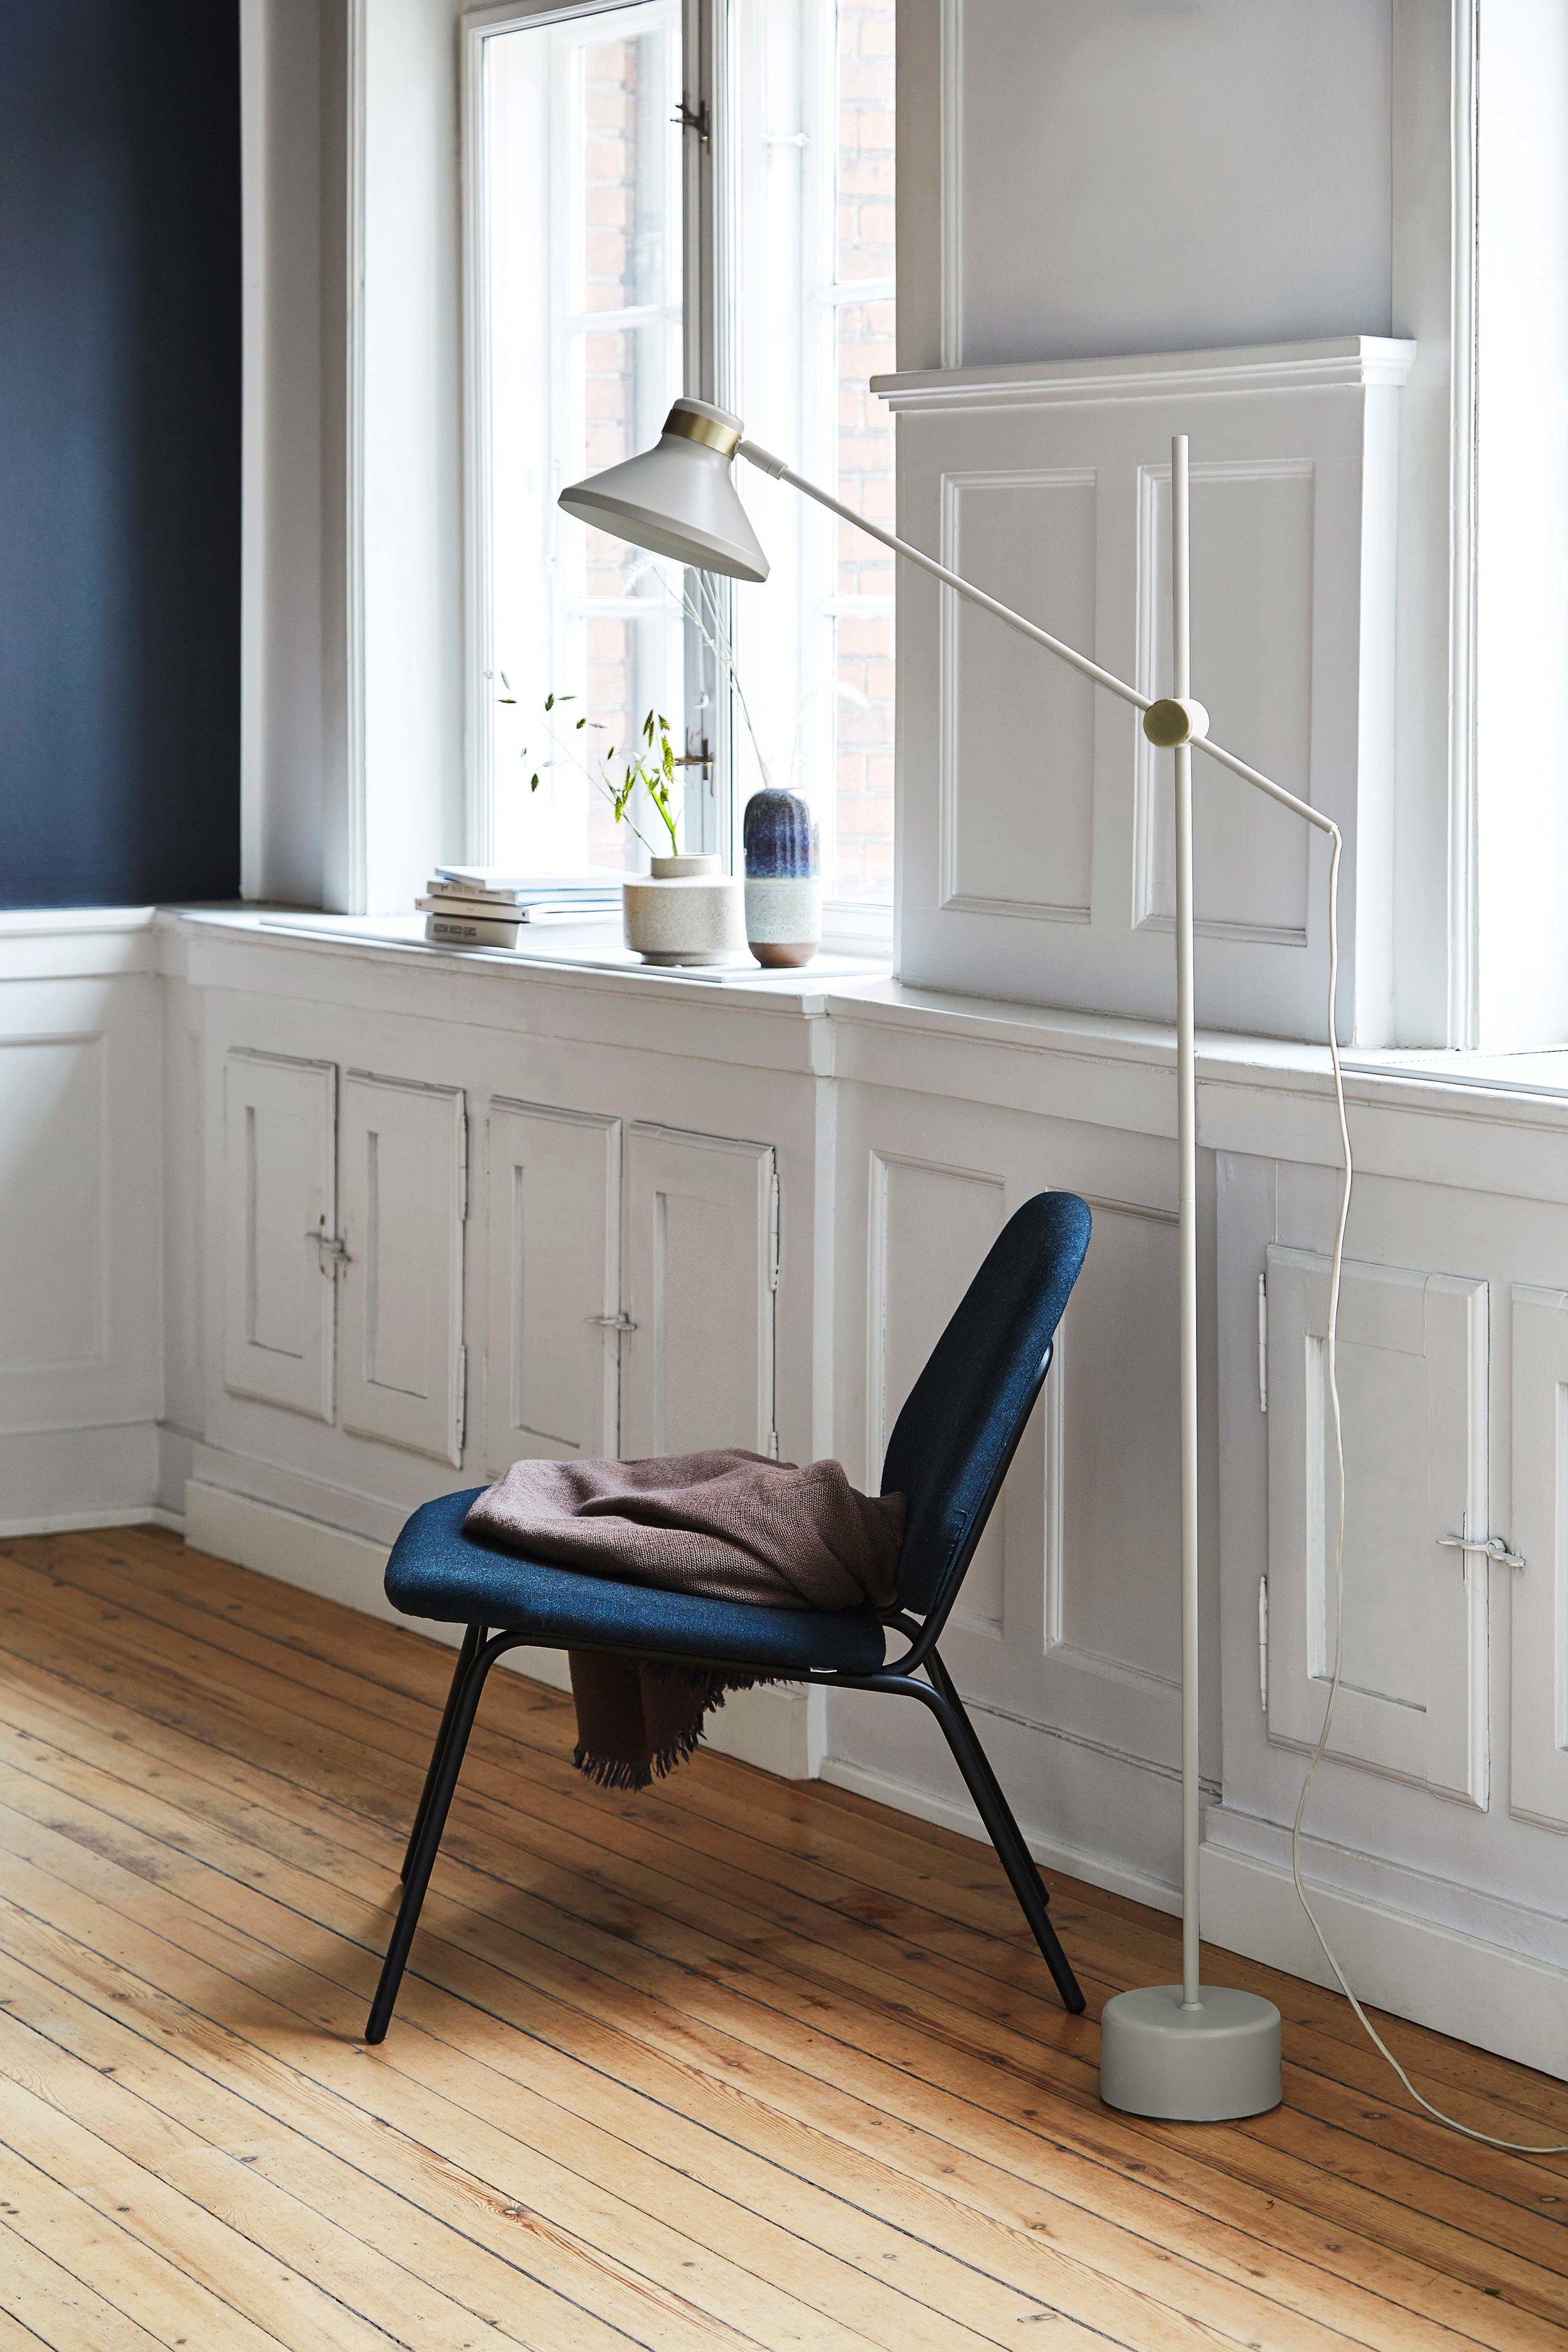 MR-floor-lamp-taupe-antique-brass---lifestyle-Raadhusgade-3275.jpg